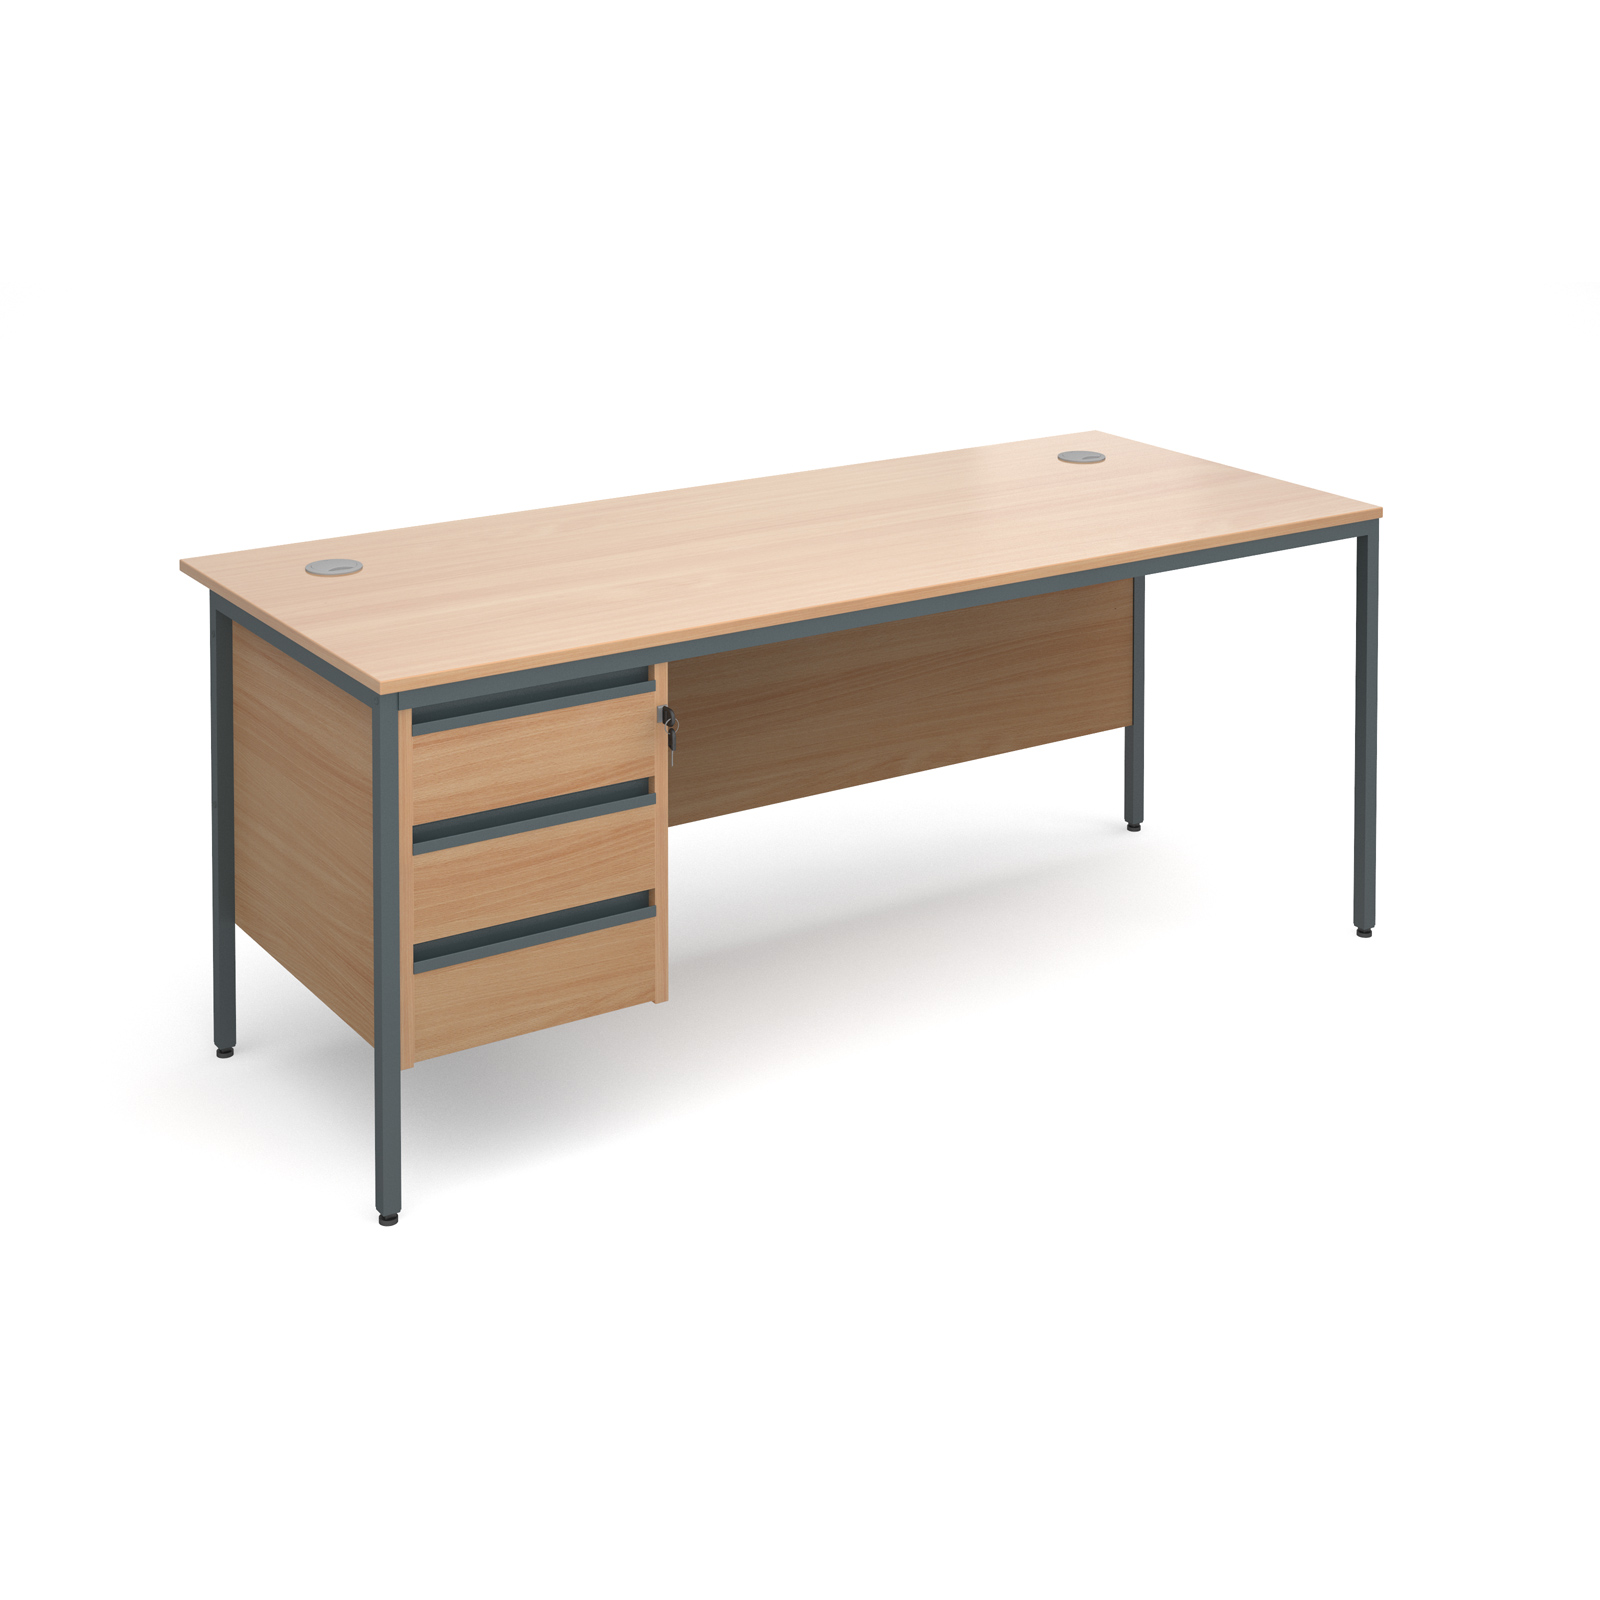 Home Office Furniture Uk Desk Set 18: Dams Maestro 18 Straight Office Desk Single Pedestal